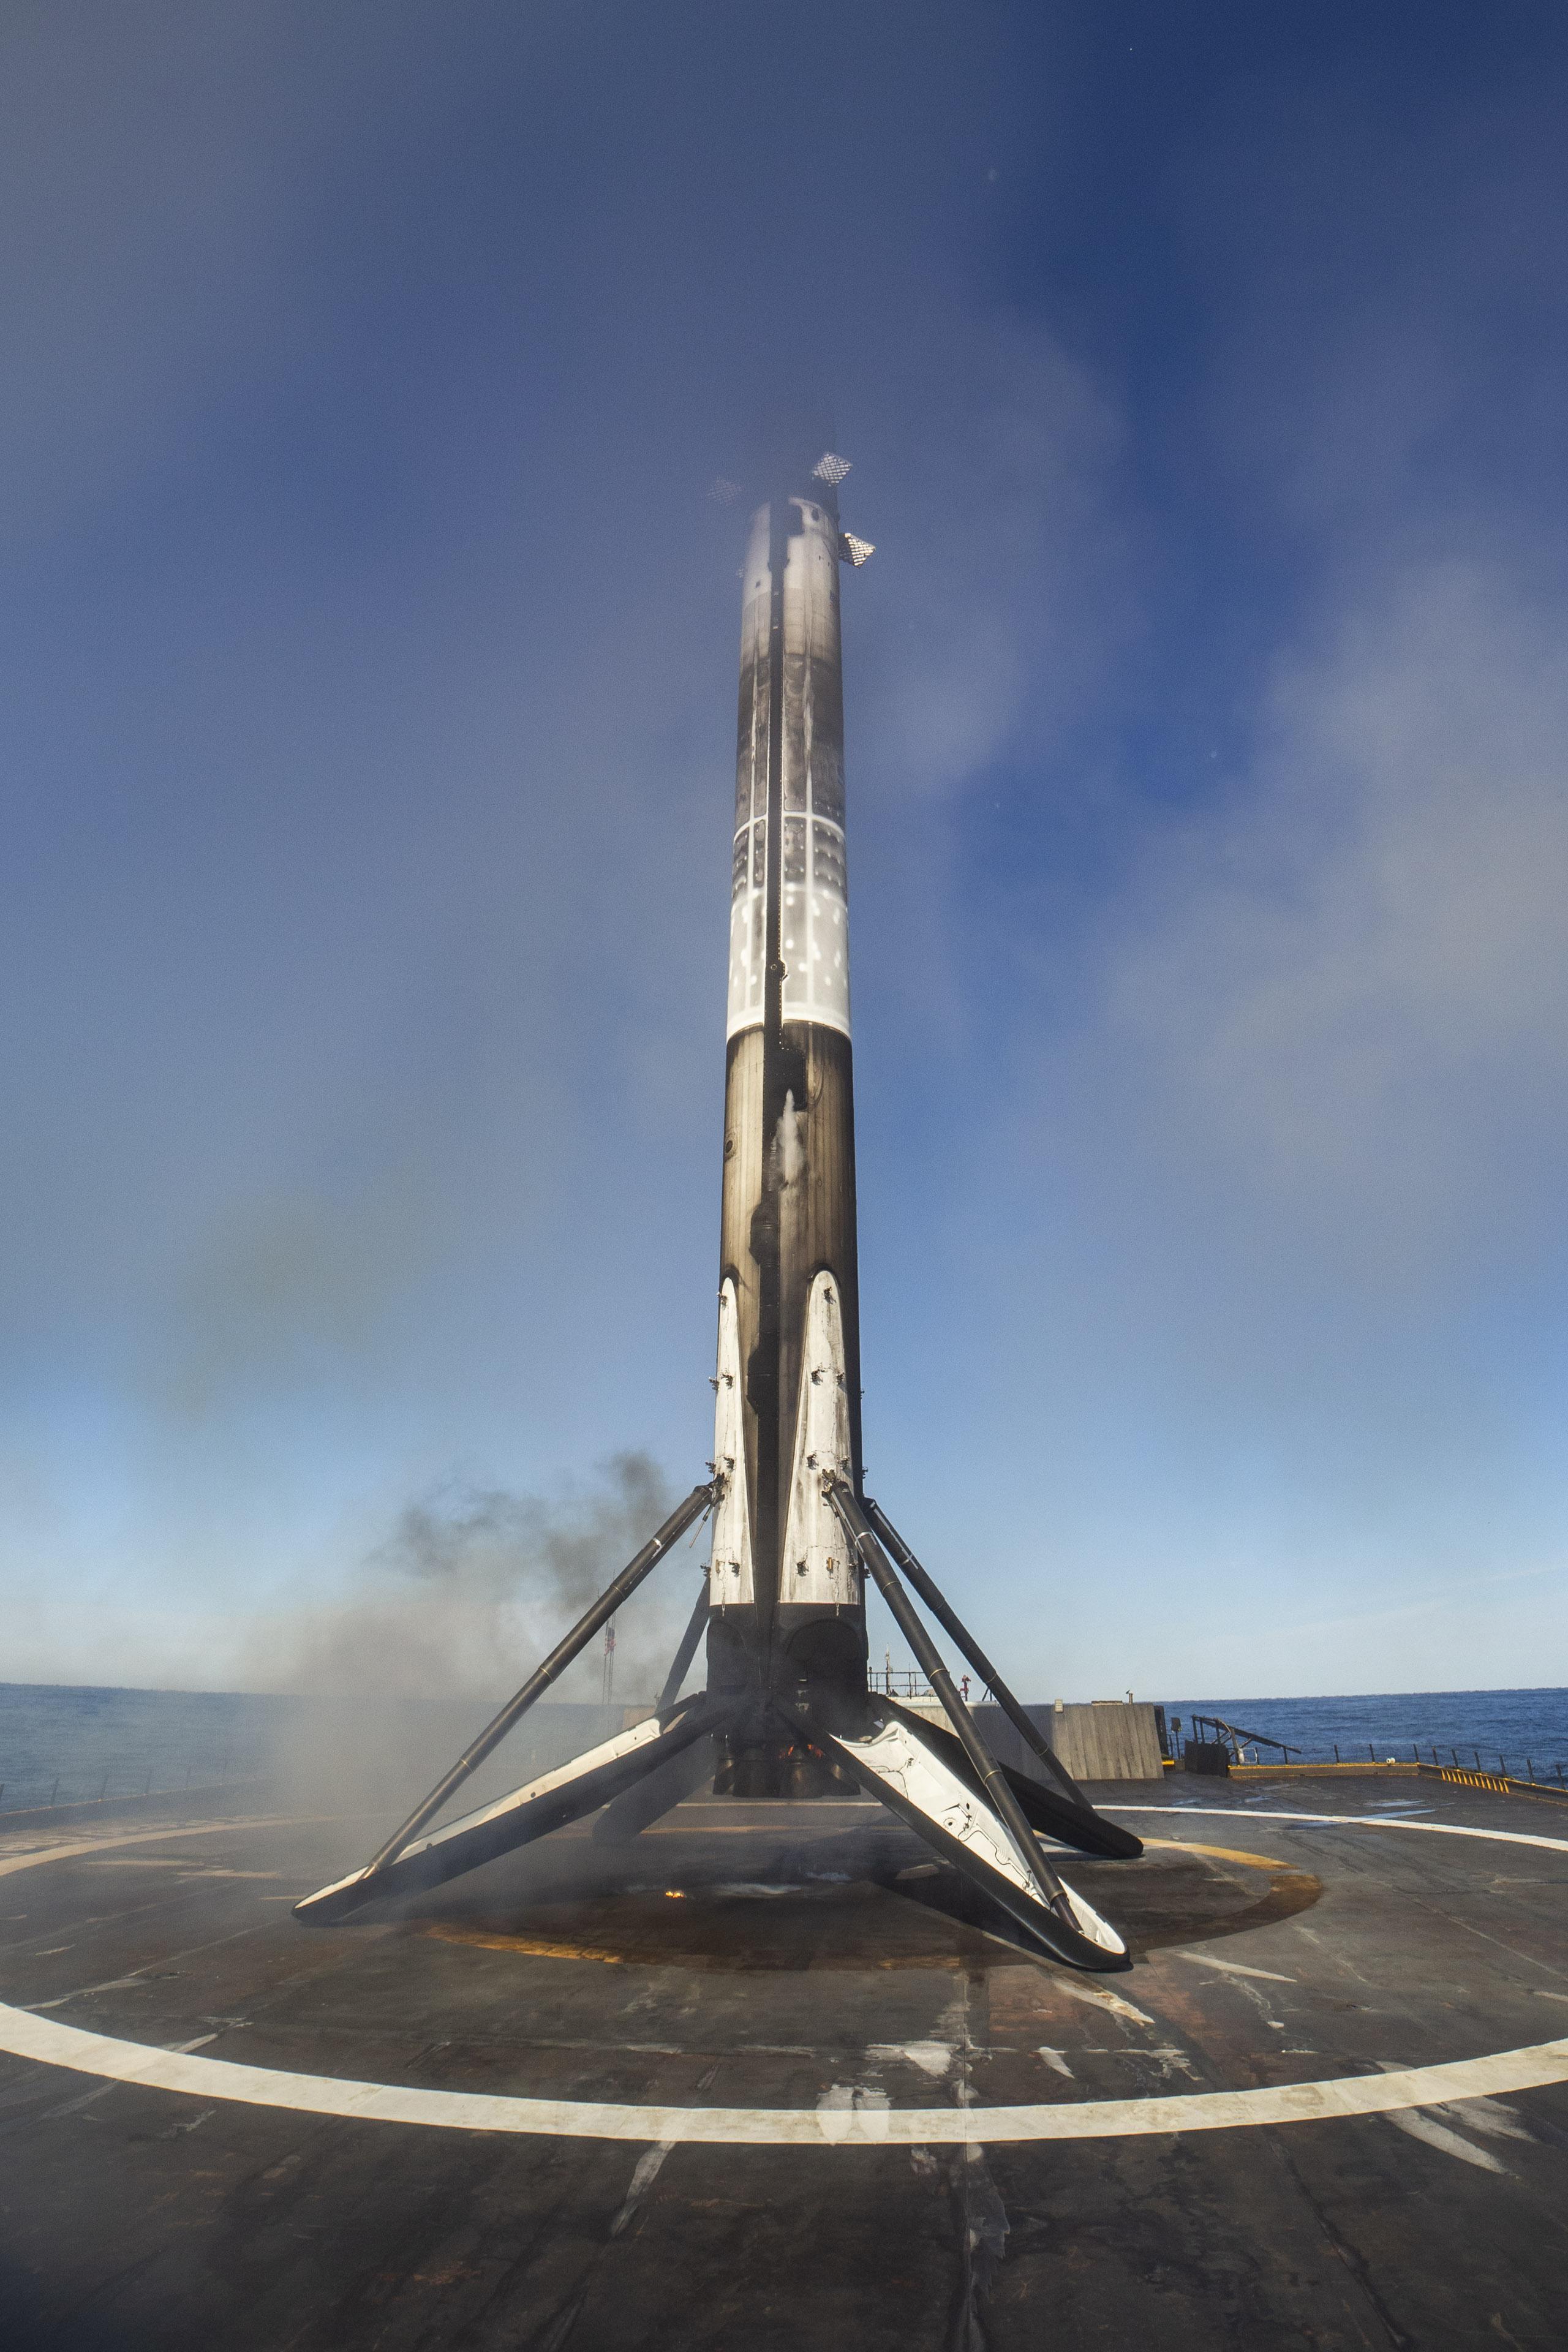 Falcon 9 B1046 SSO-A third landing (SpaceX) 3(c)